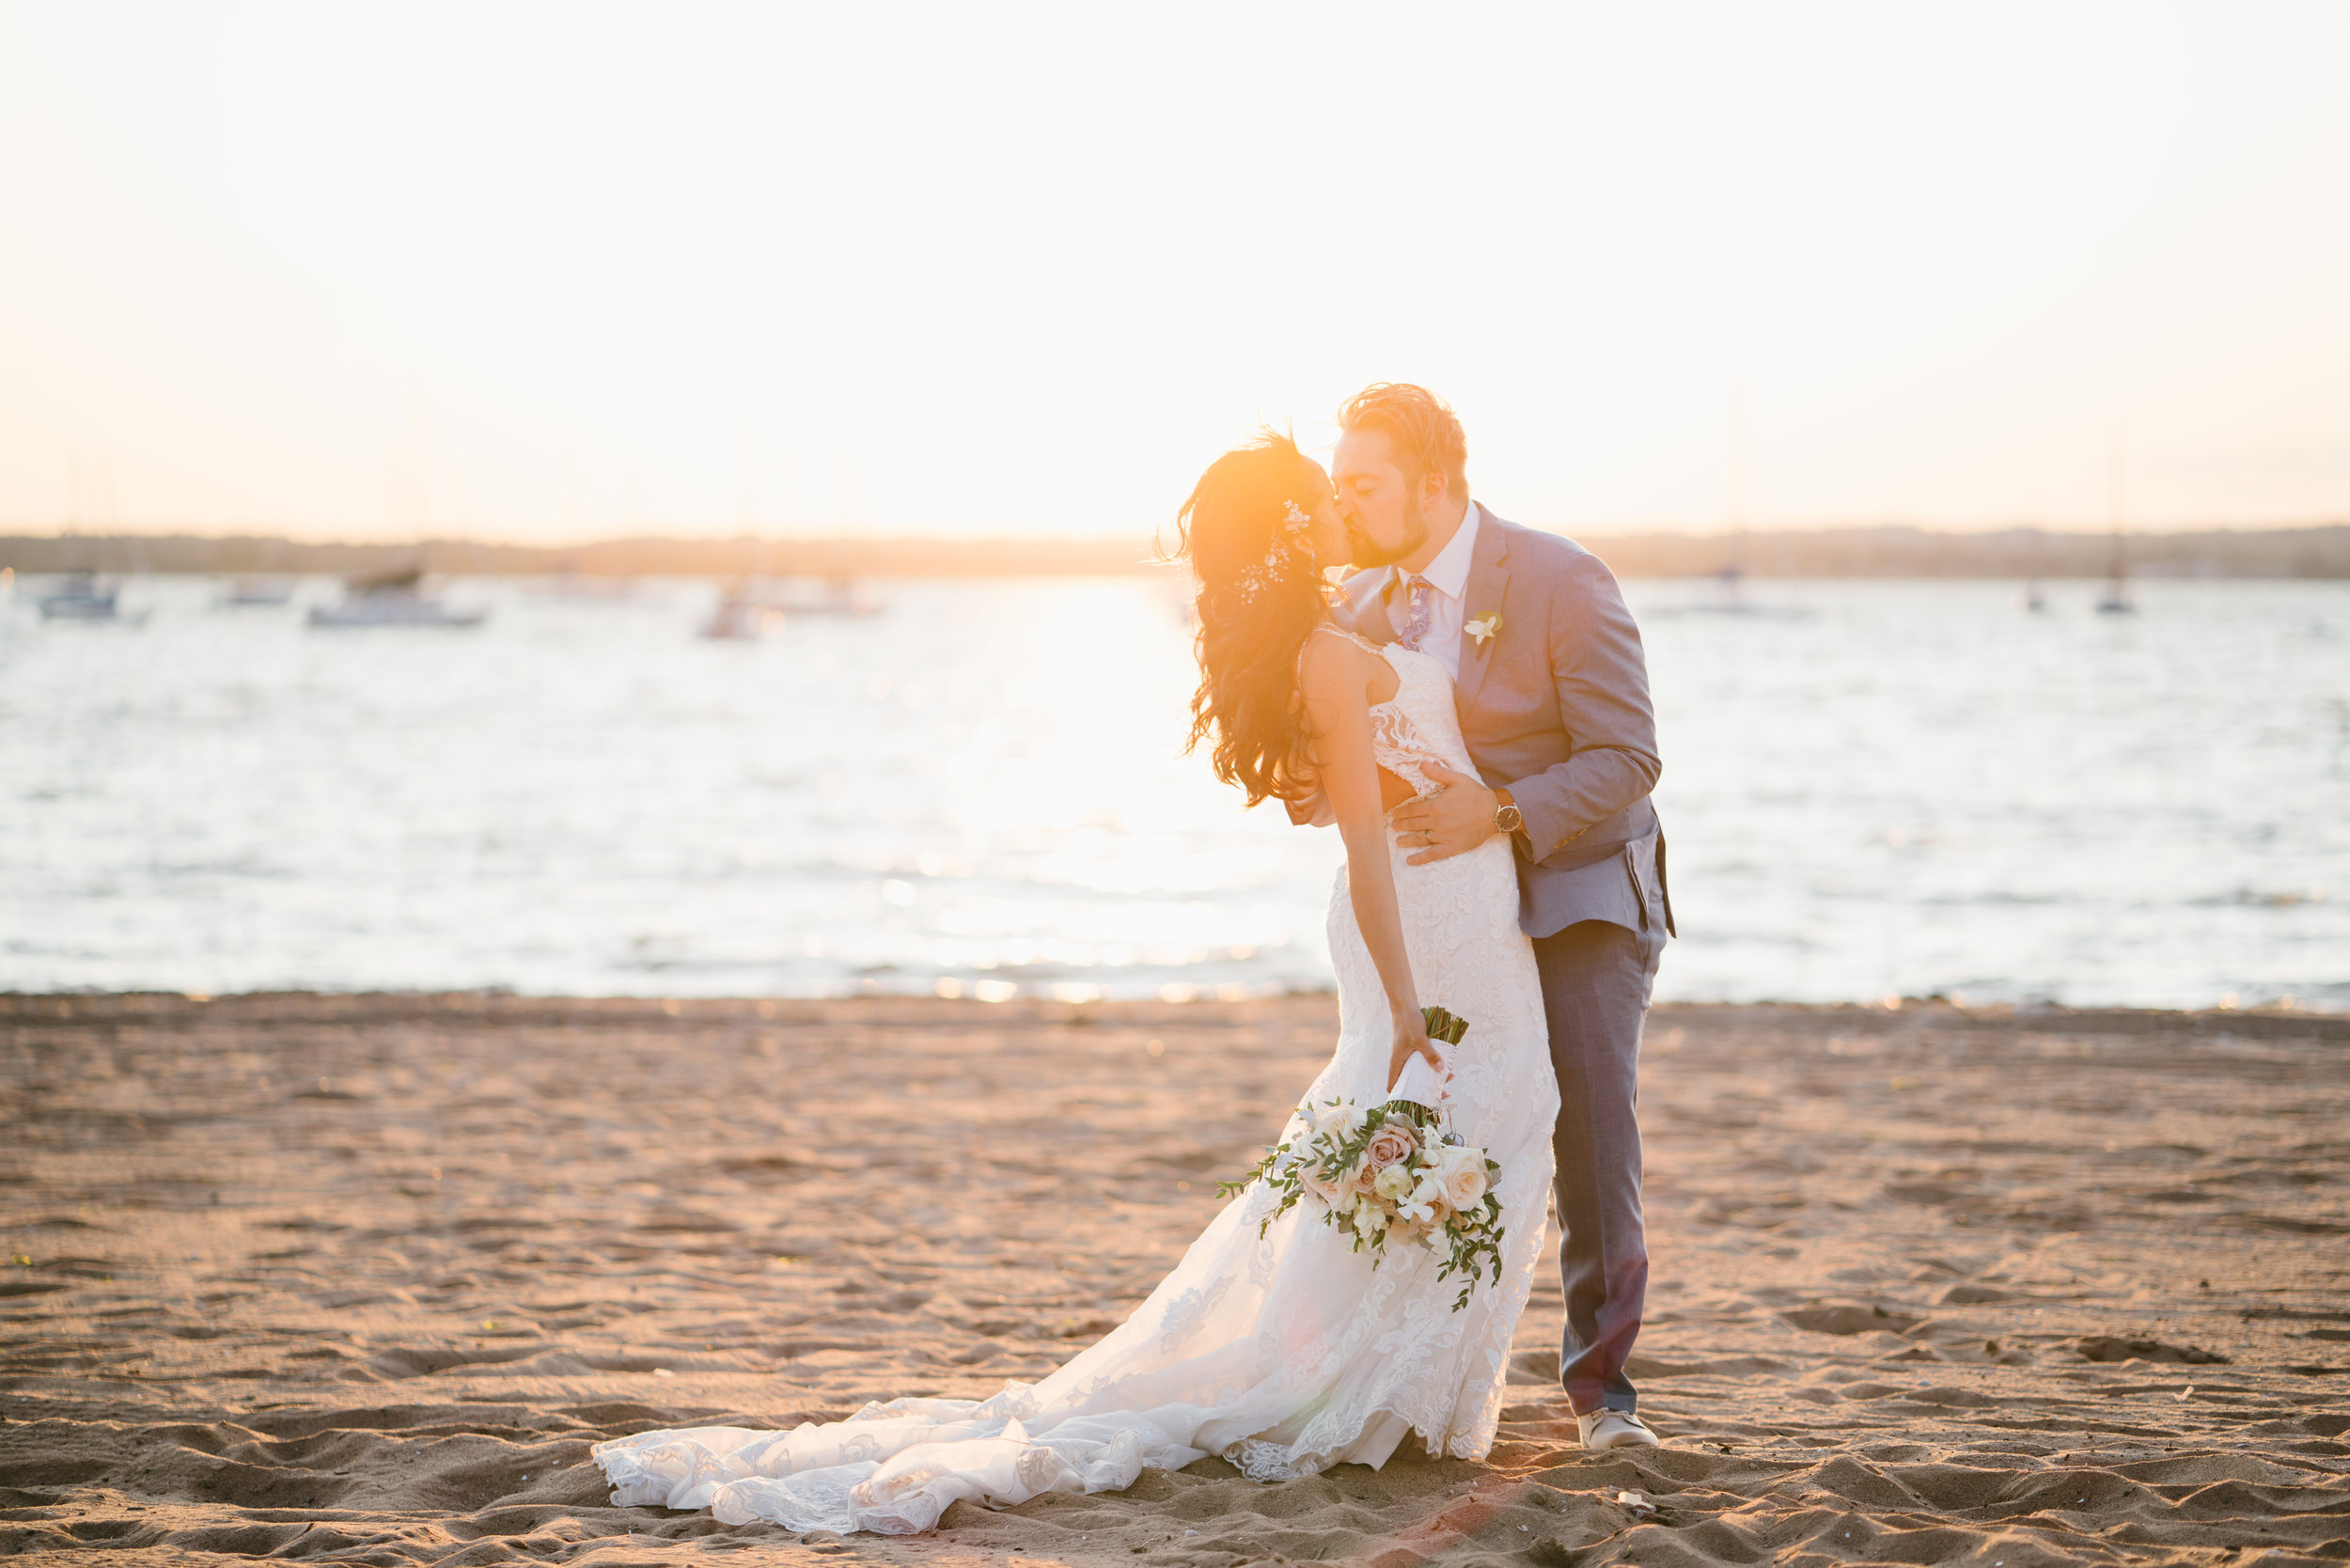 sunset photo of bride and groom on beach in Malibu